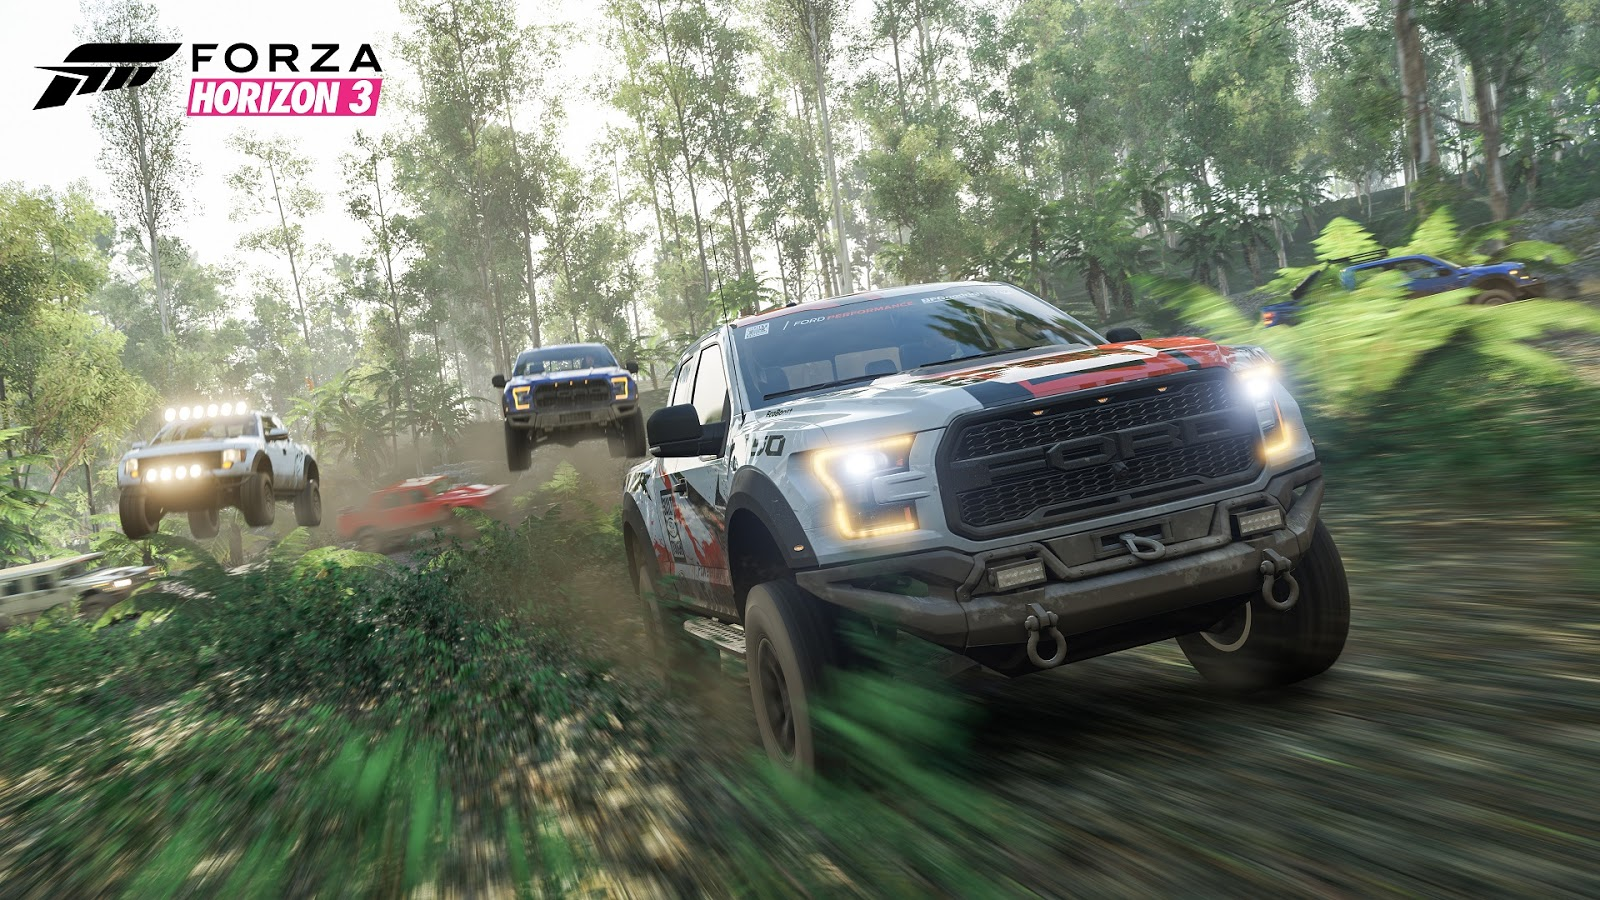 Forza Horizon 3 v1 0 119 1002 + 44 DLCs - CorePack | Fitgirl Repack